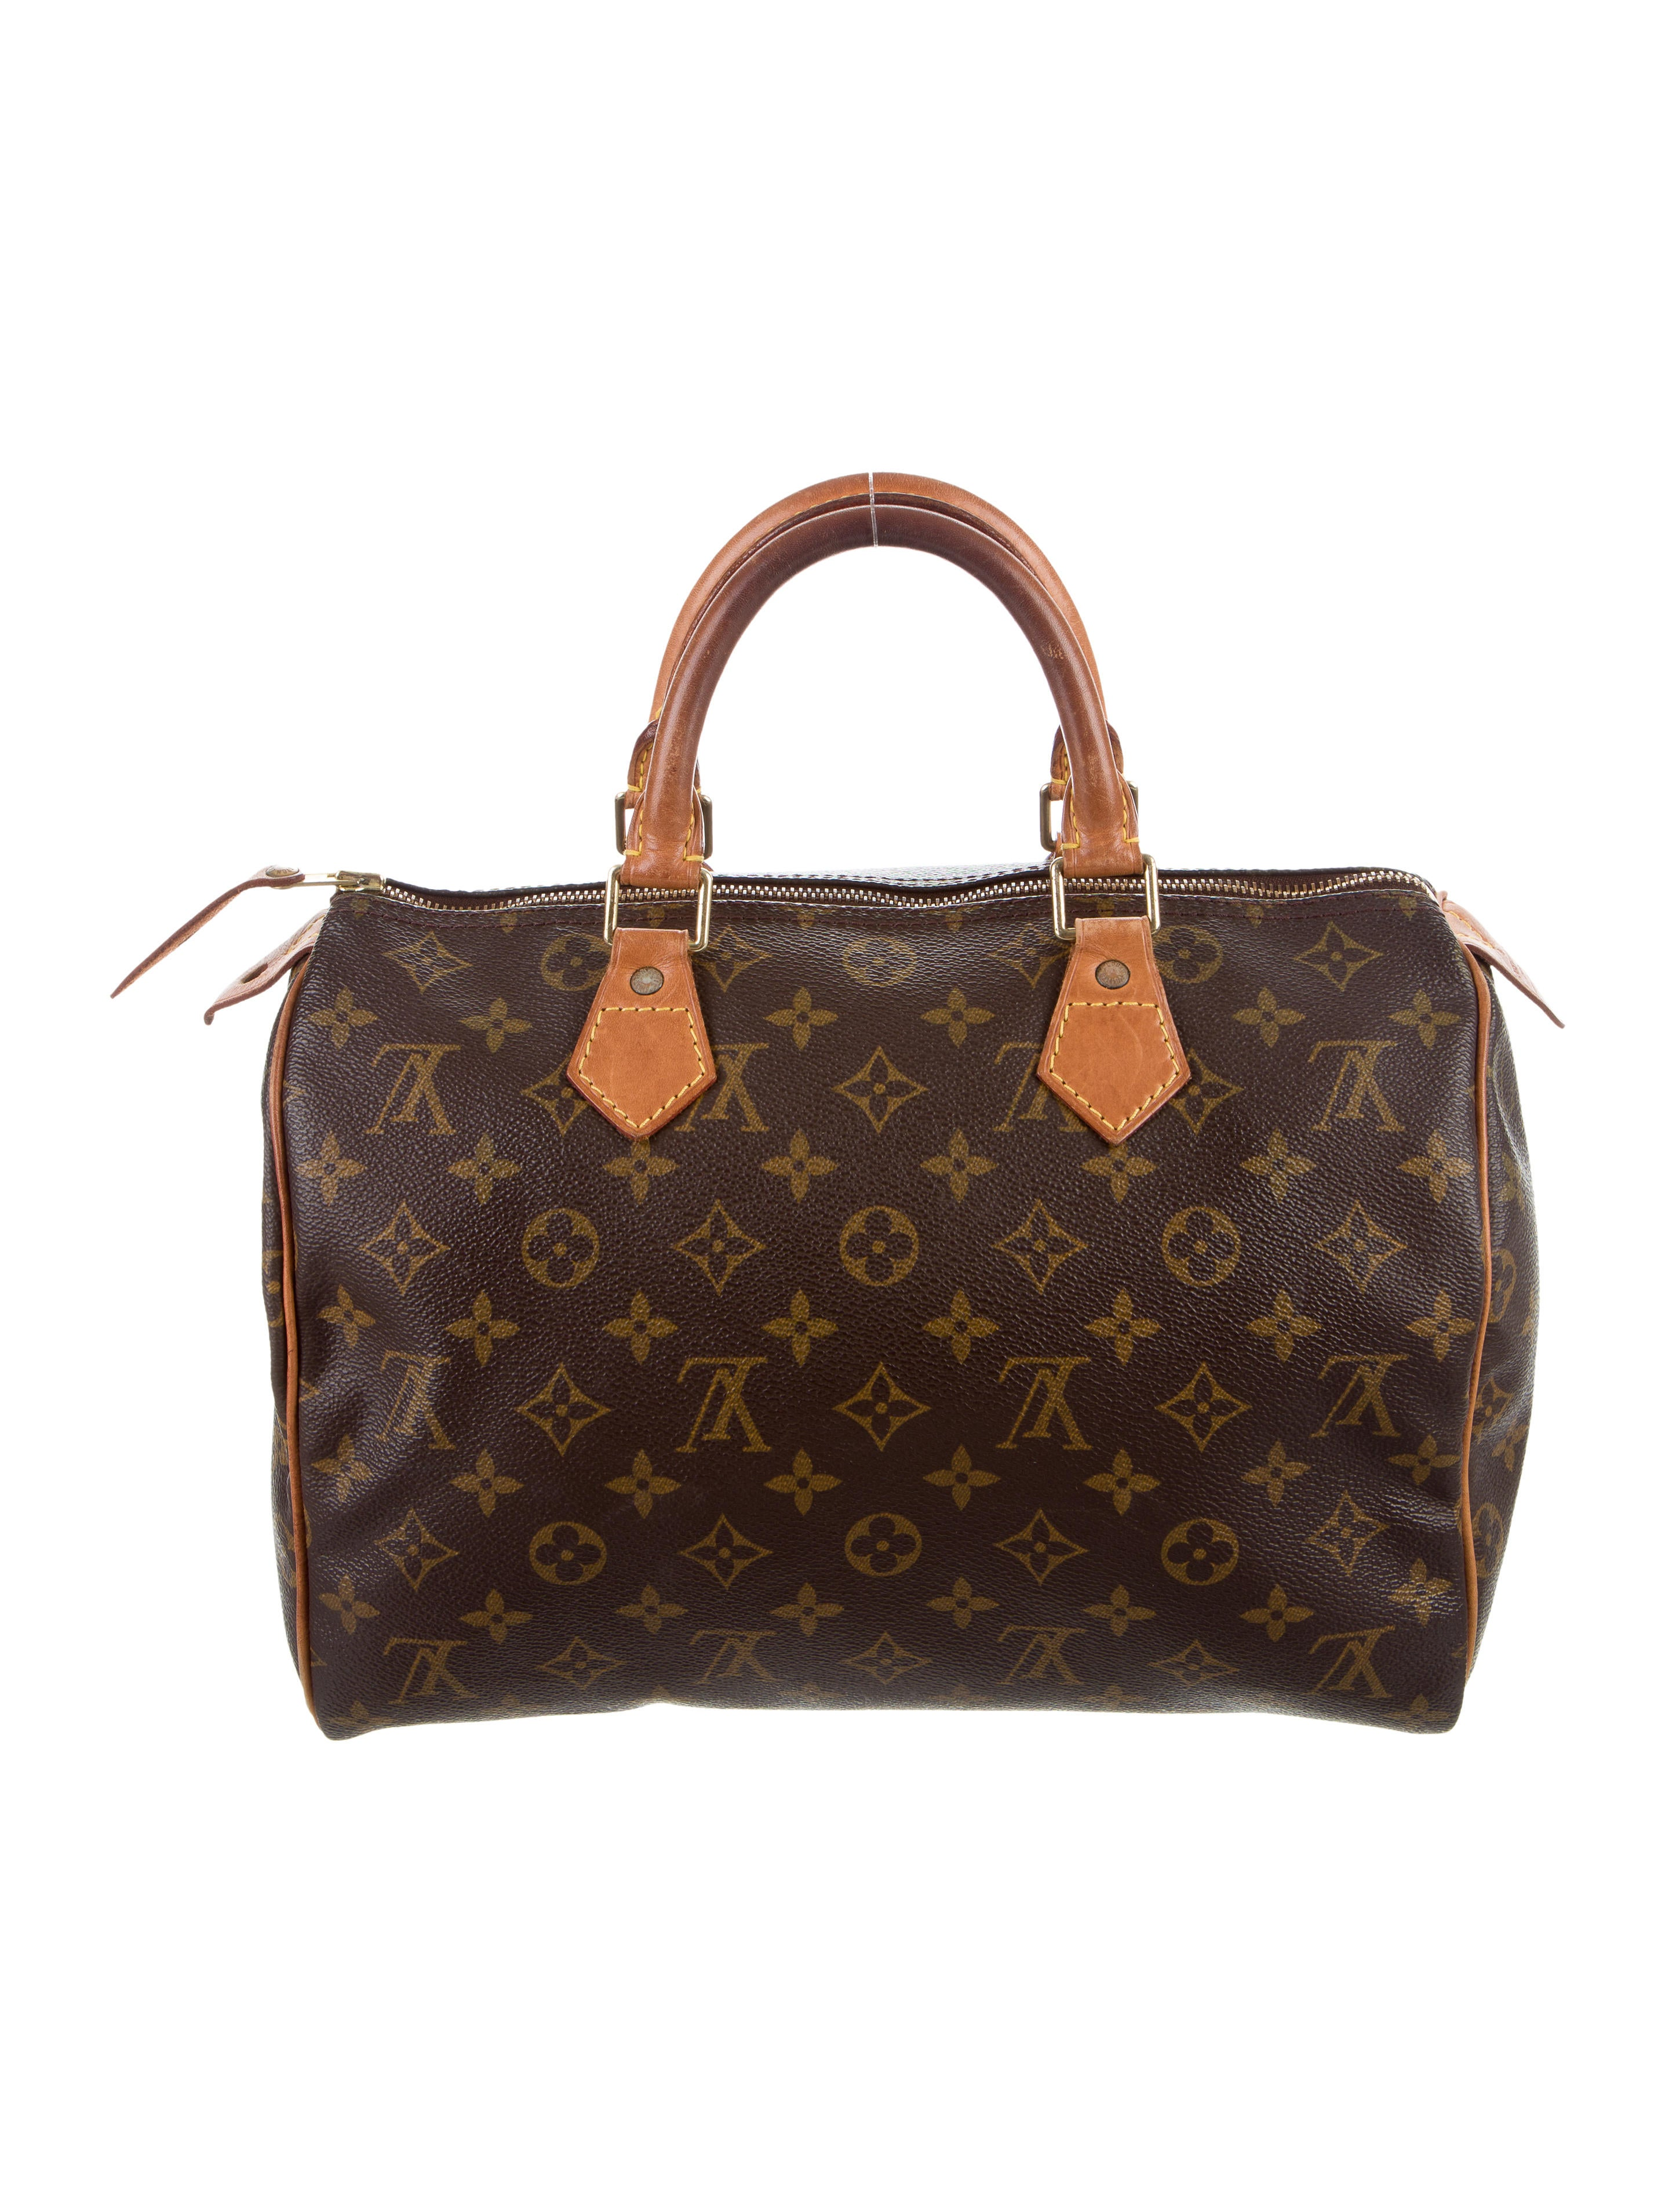 louis vuitton monogram speedy 30 handbags lou118765. Black Bedroom Furniture Sets. Home Design Ideas